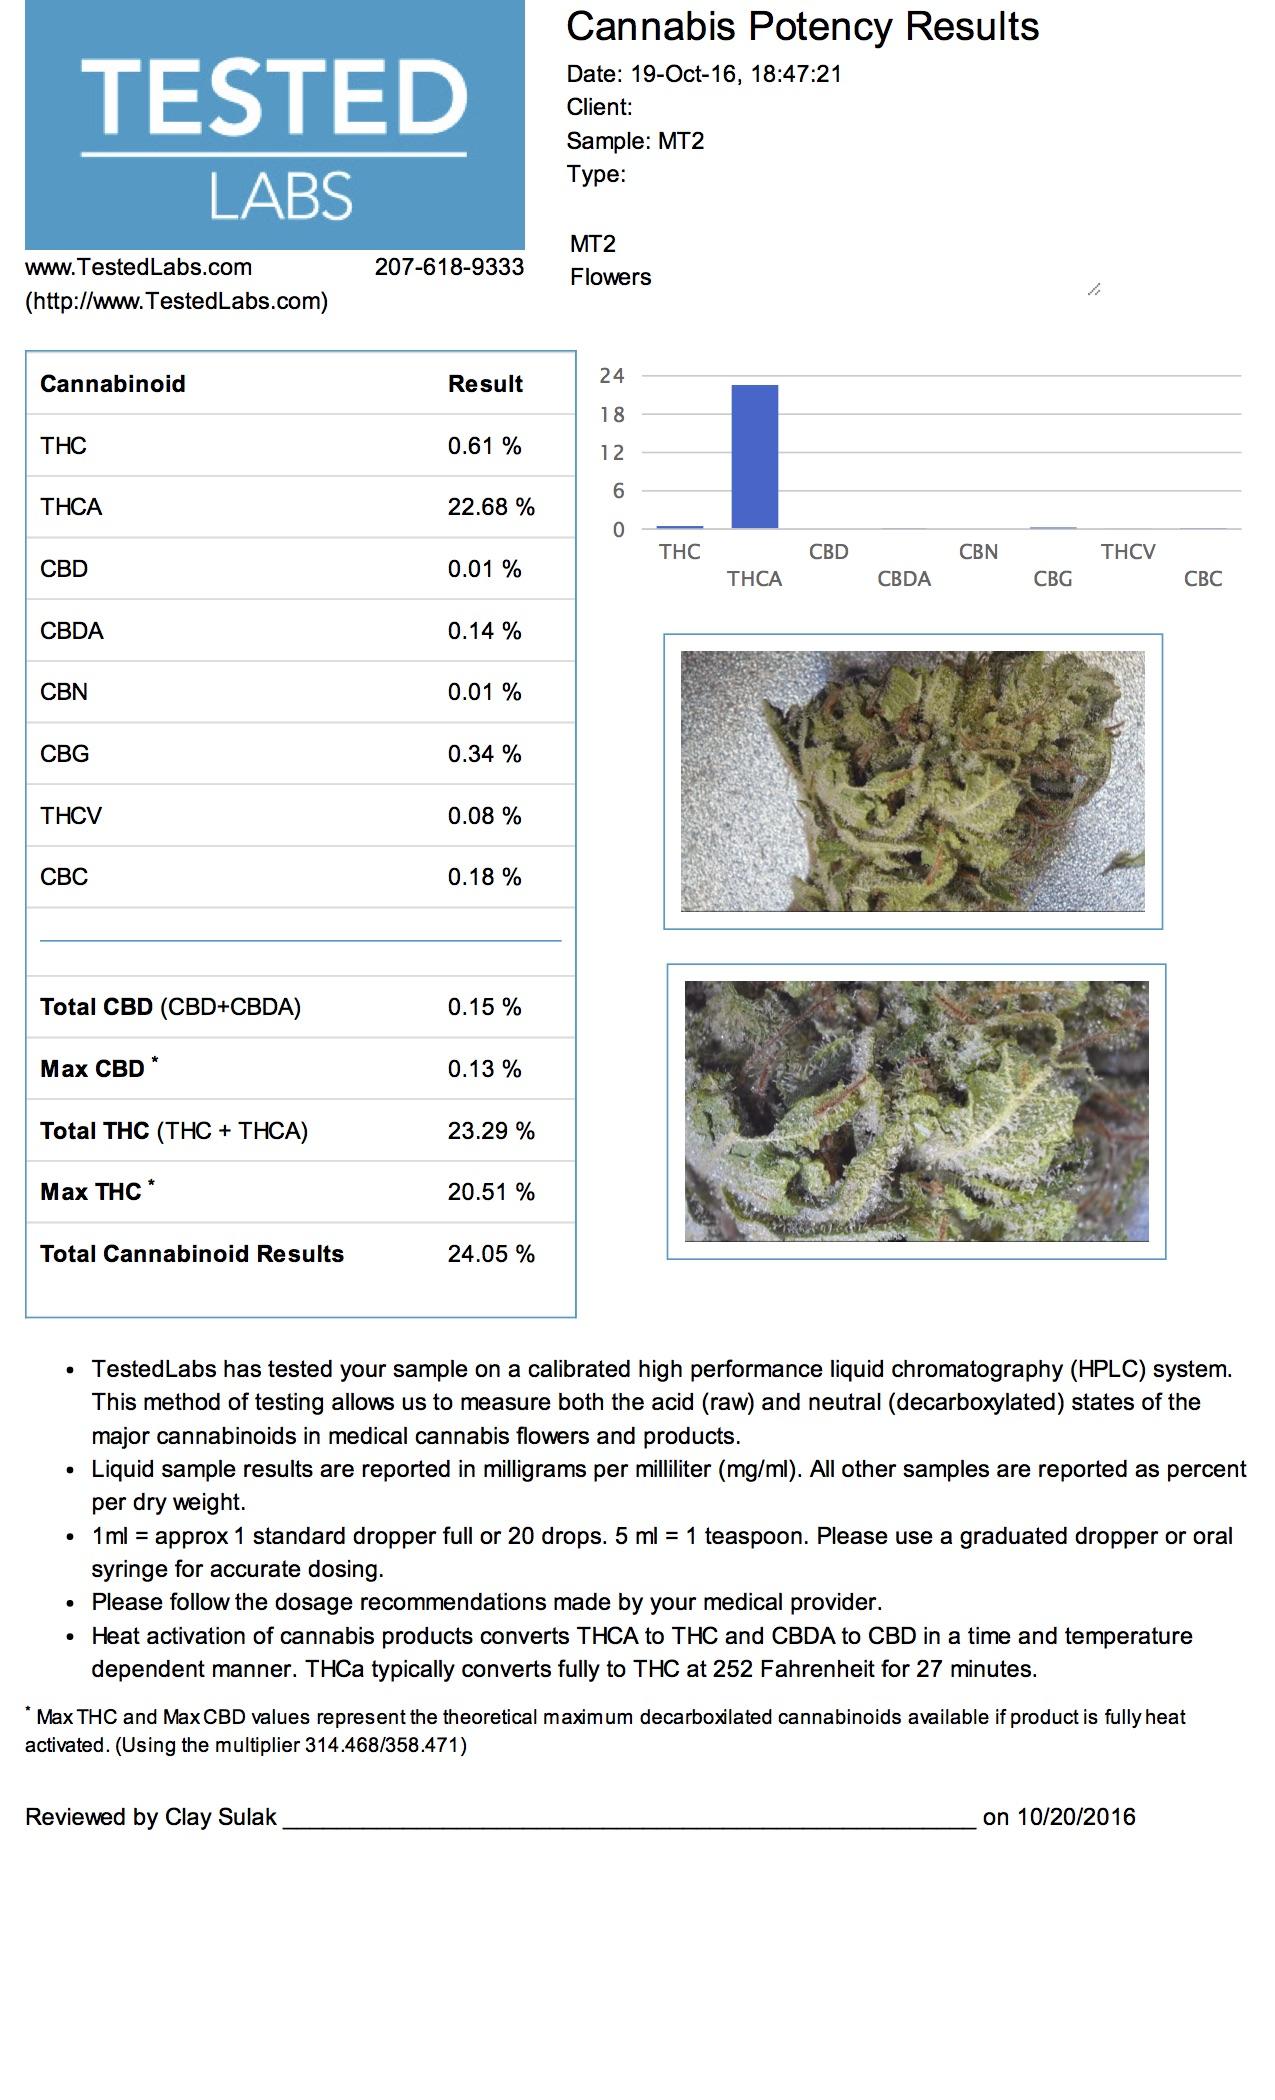 Moontang (Pheno 2) (Cannabinoid)